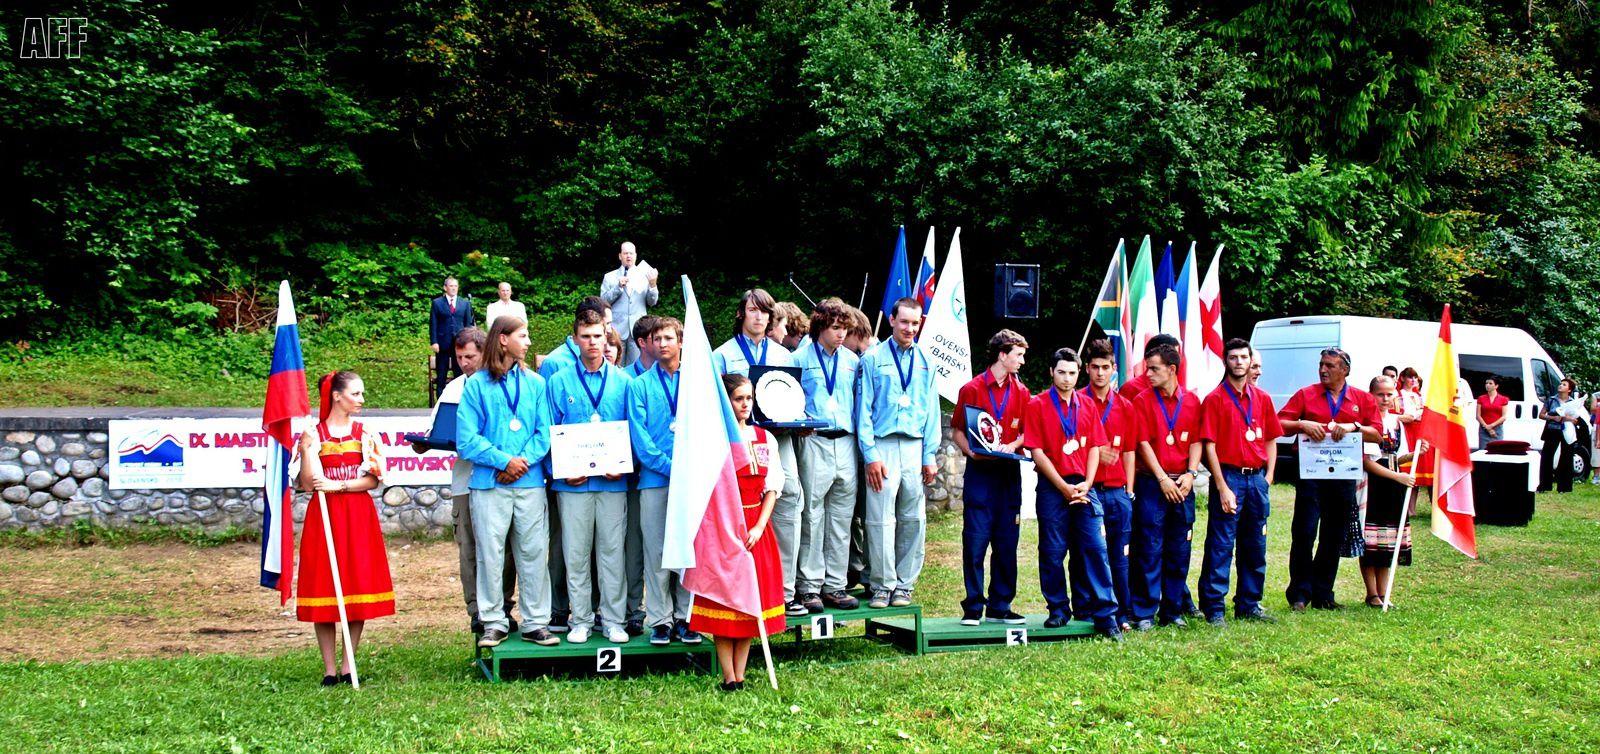 Podium final: 1 - CZECH REPUBLIC, 2 - SLOVAKIA, 3 - ESPAÑA.